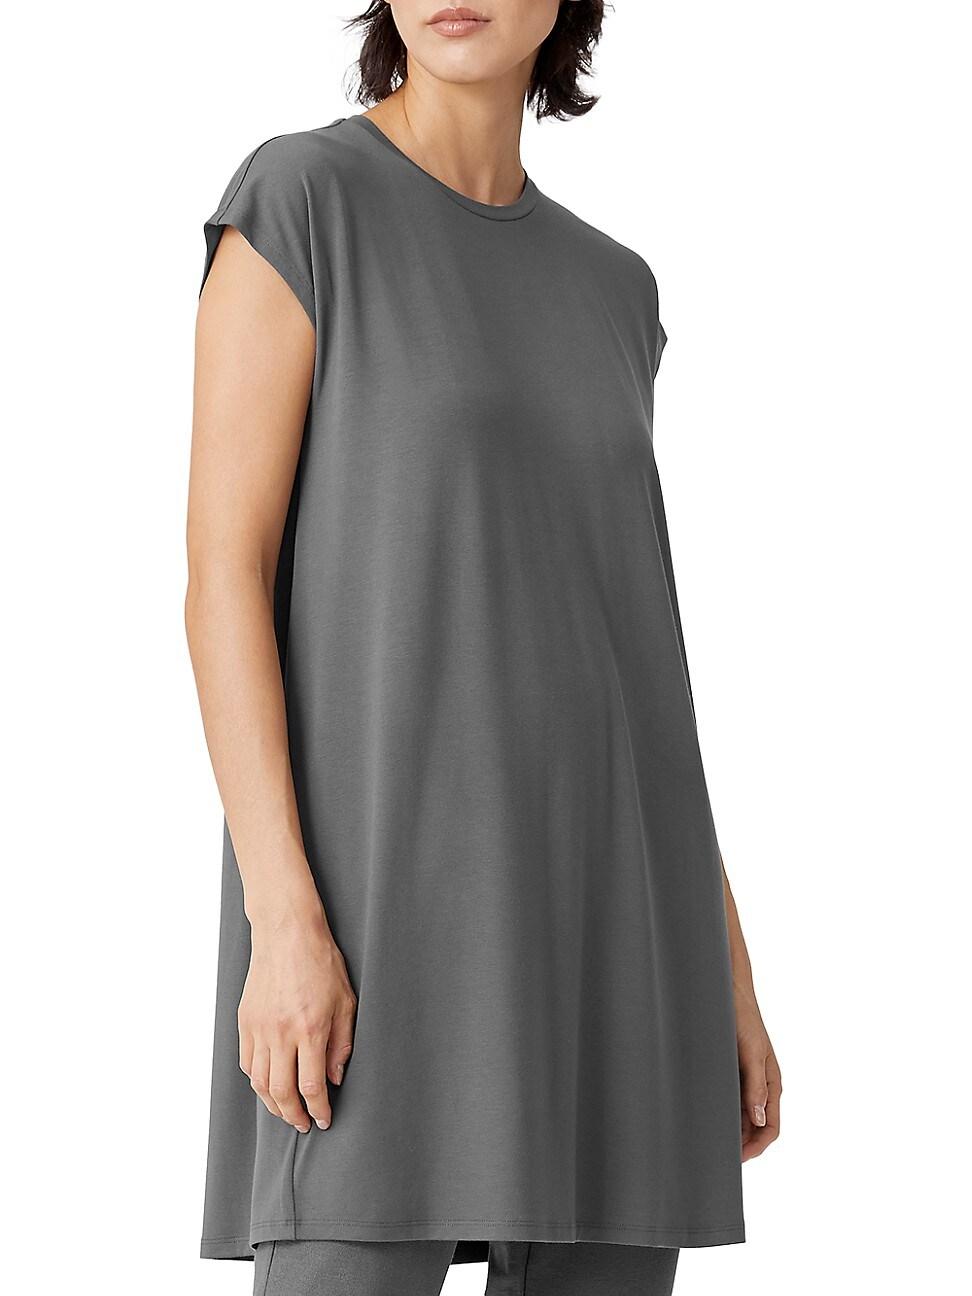 Eileen Fisher Dresses WOMEN'S CREWNECK SHORT BOXY DRESS